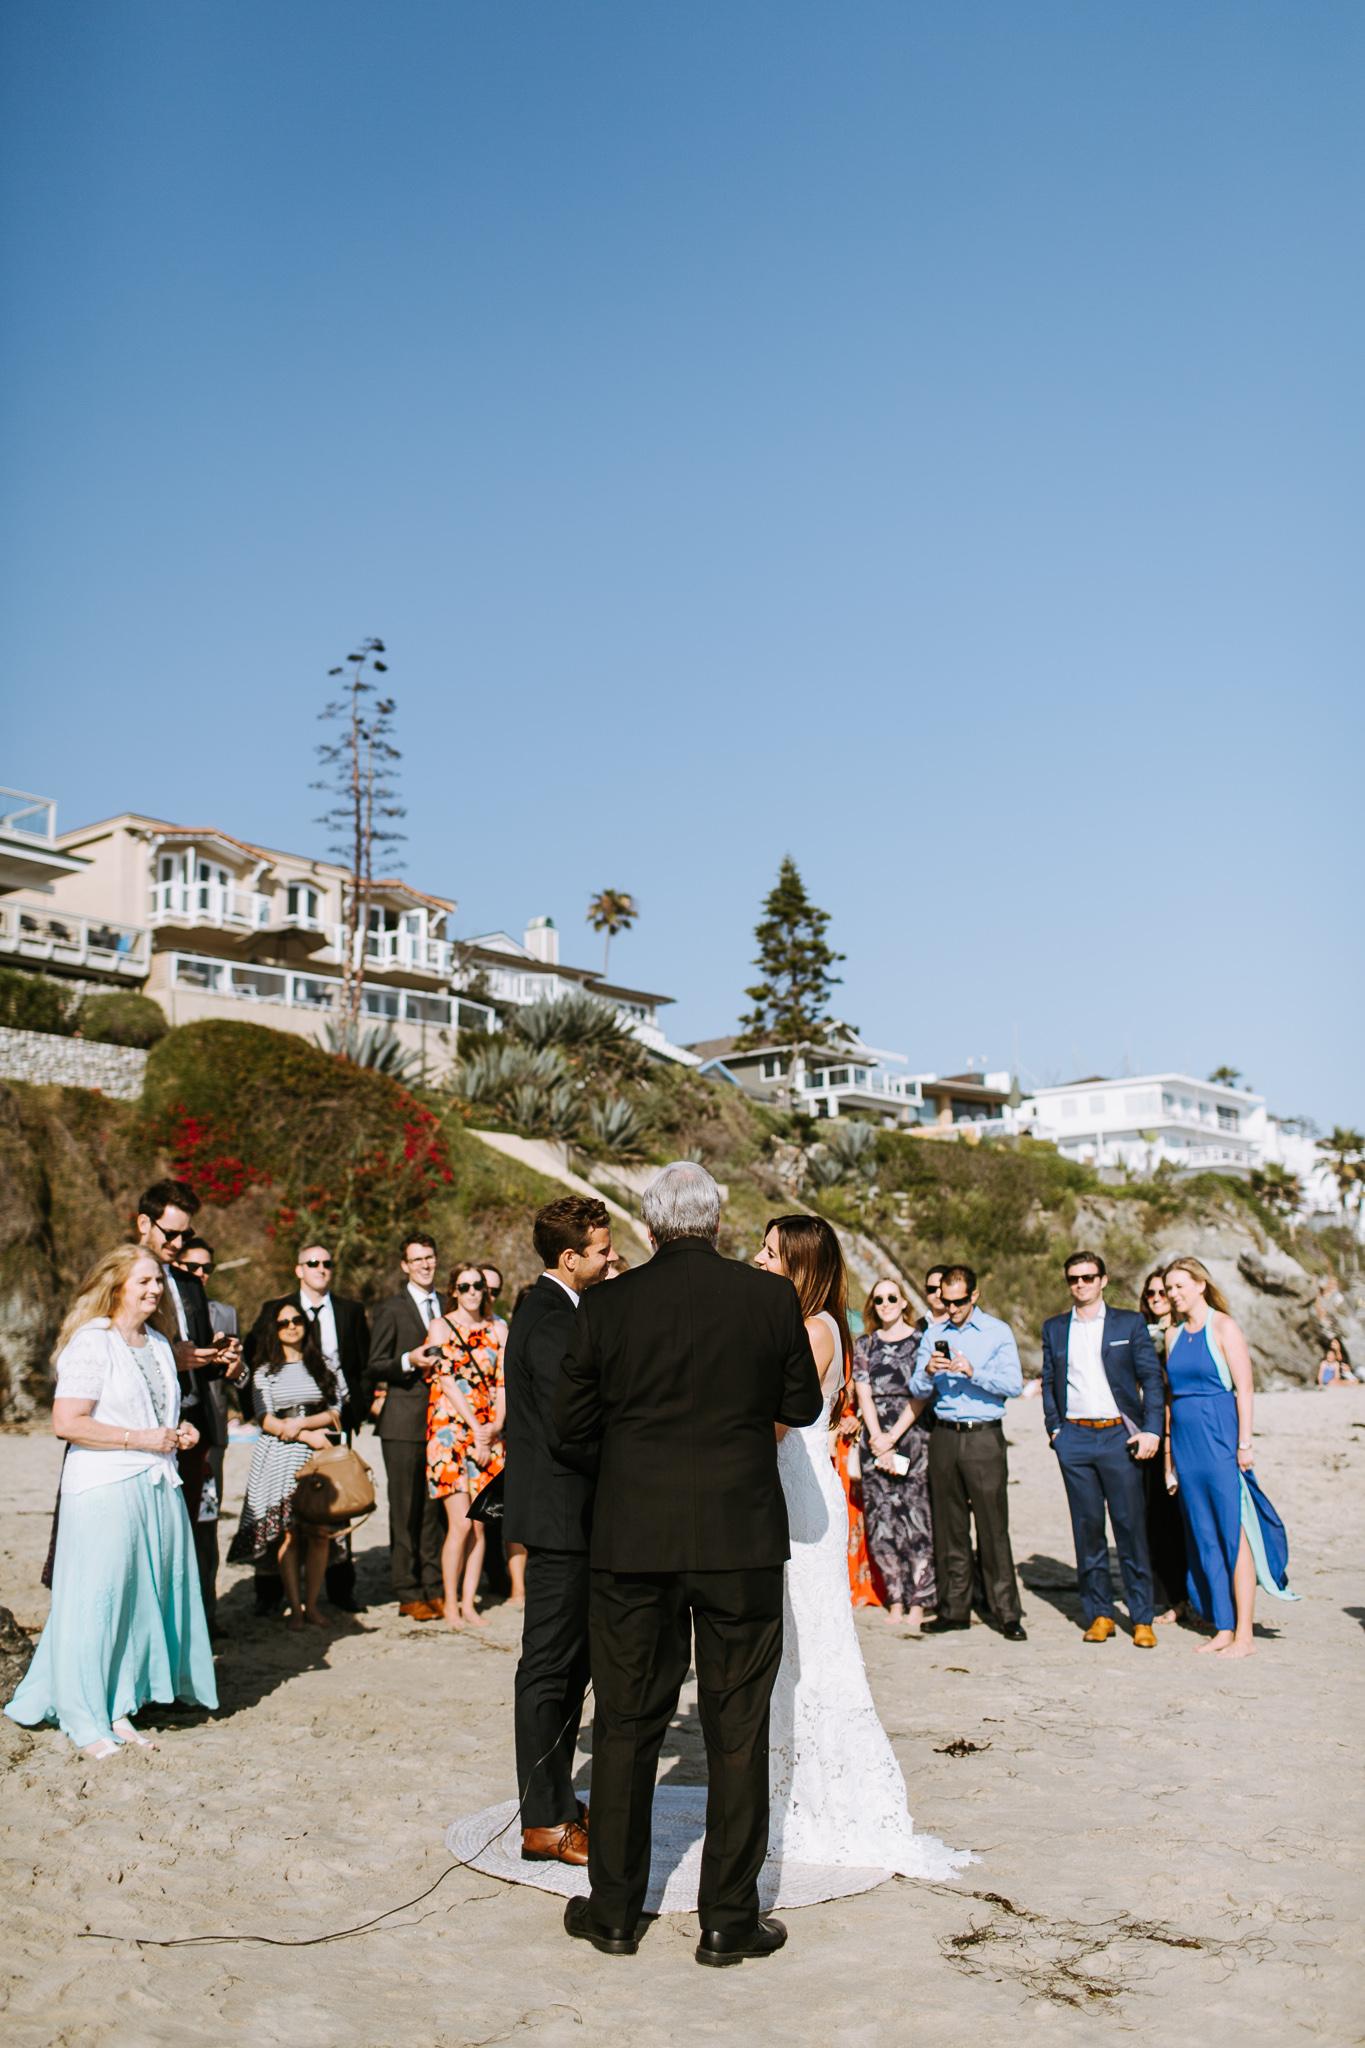 LagunaBeach-WeddingPhotographer-33.jpg